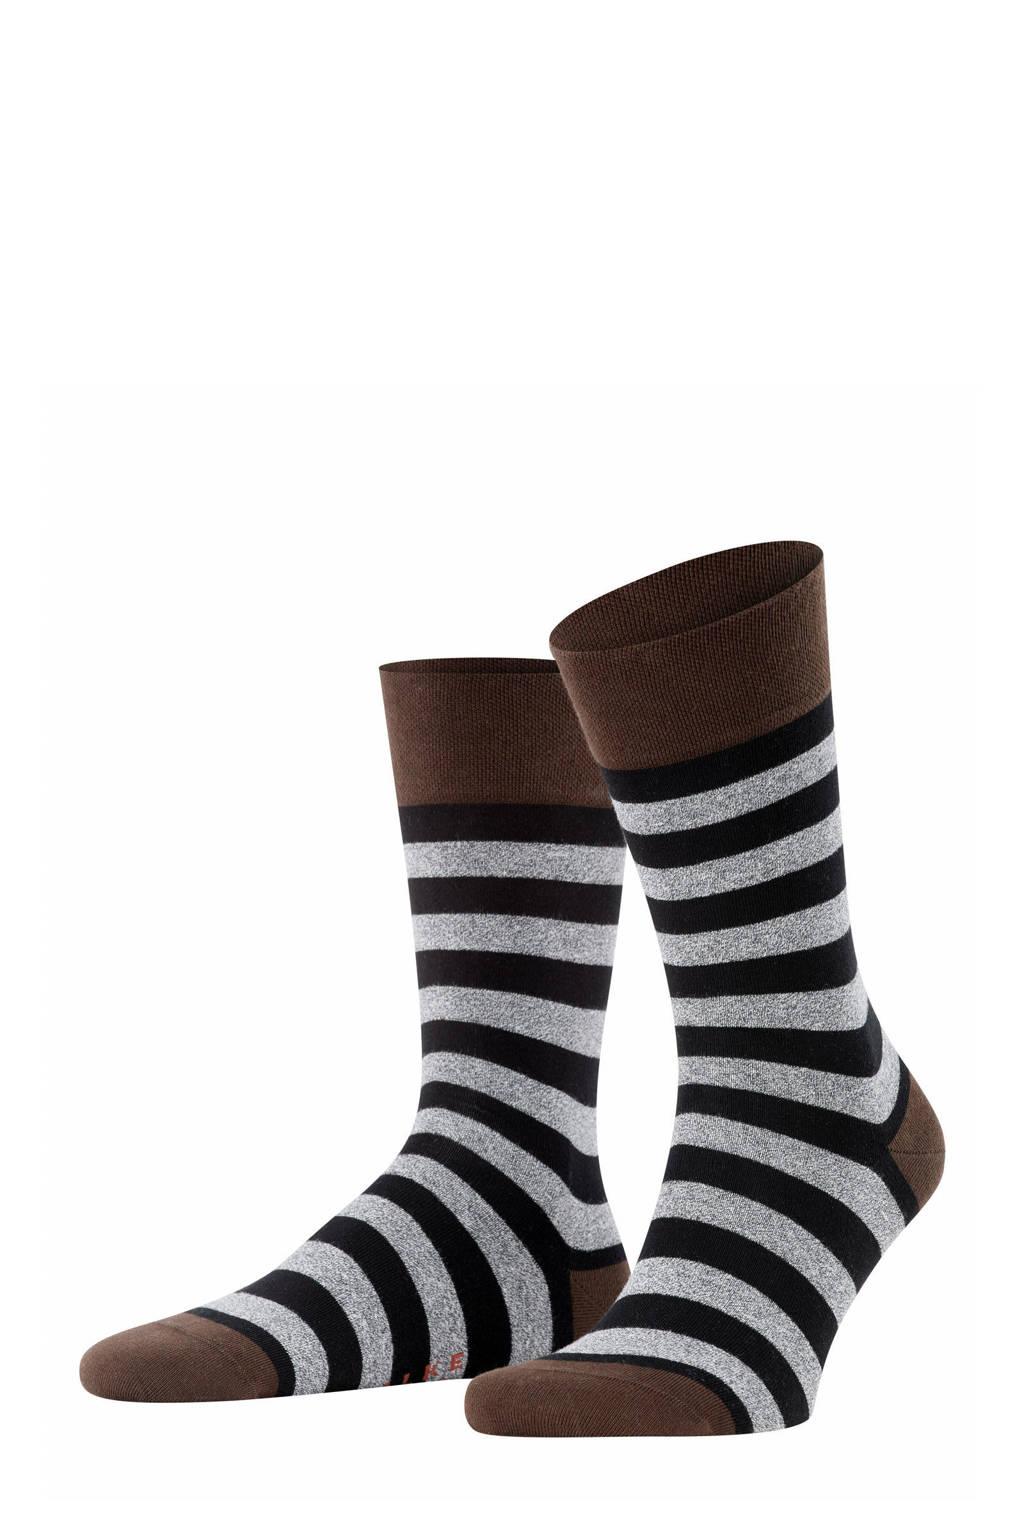 FALKE Sensitive Mapped Line sokken zwart/grijs, Zwart/grijs